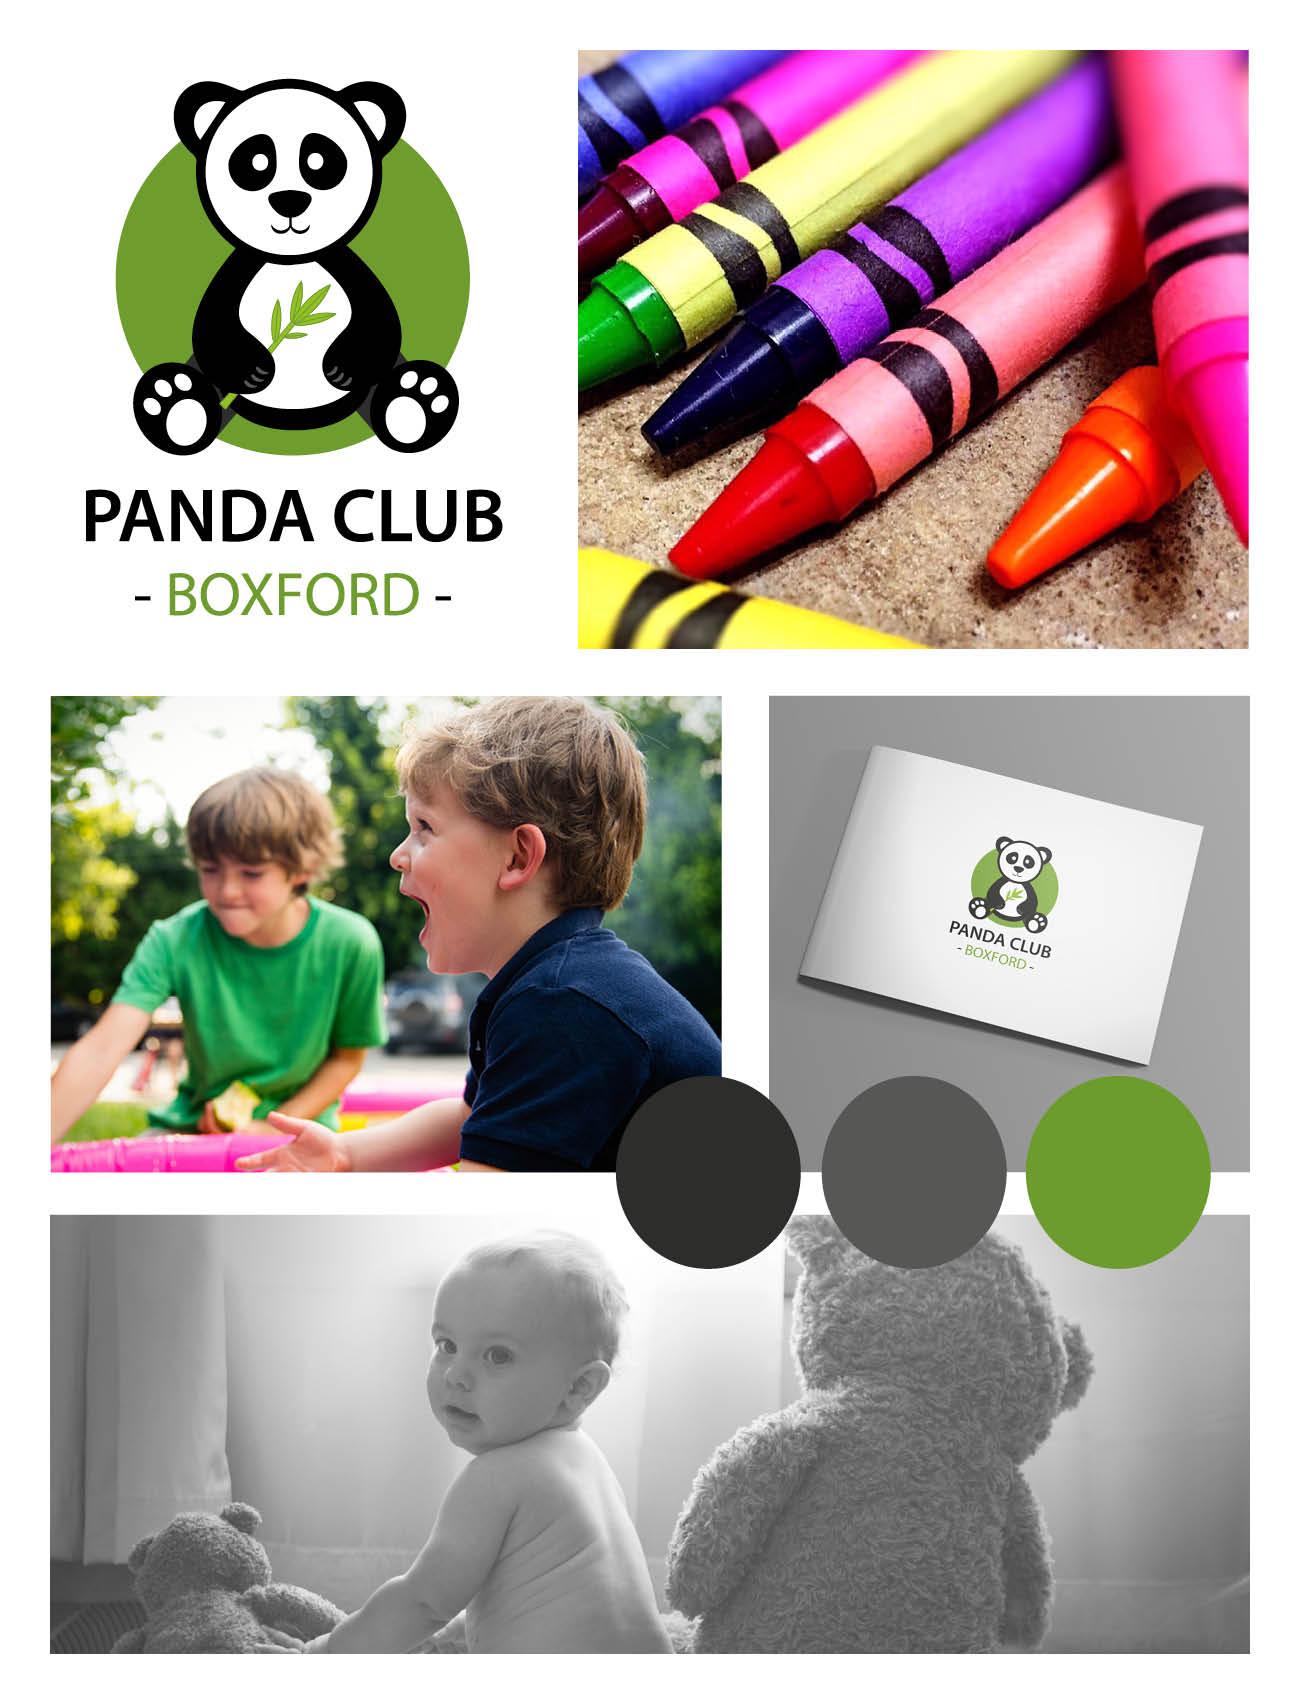 pandaclub-branddesign